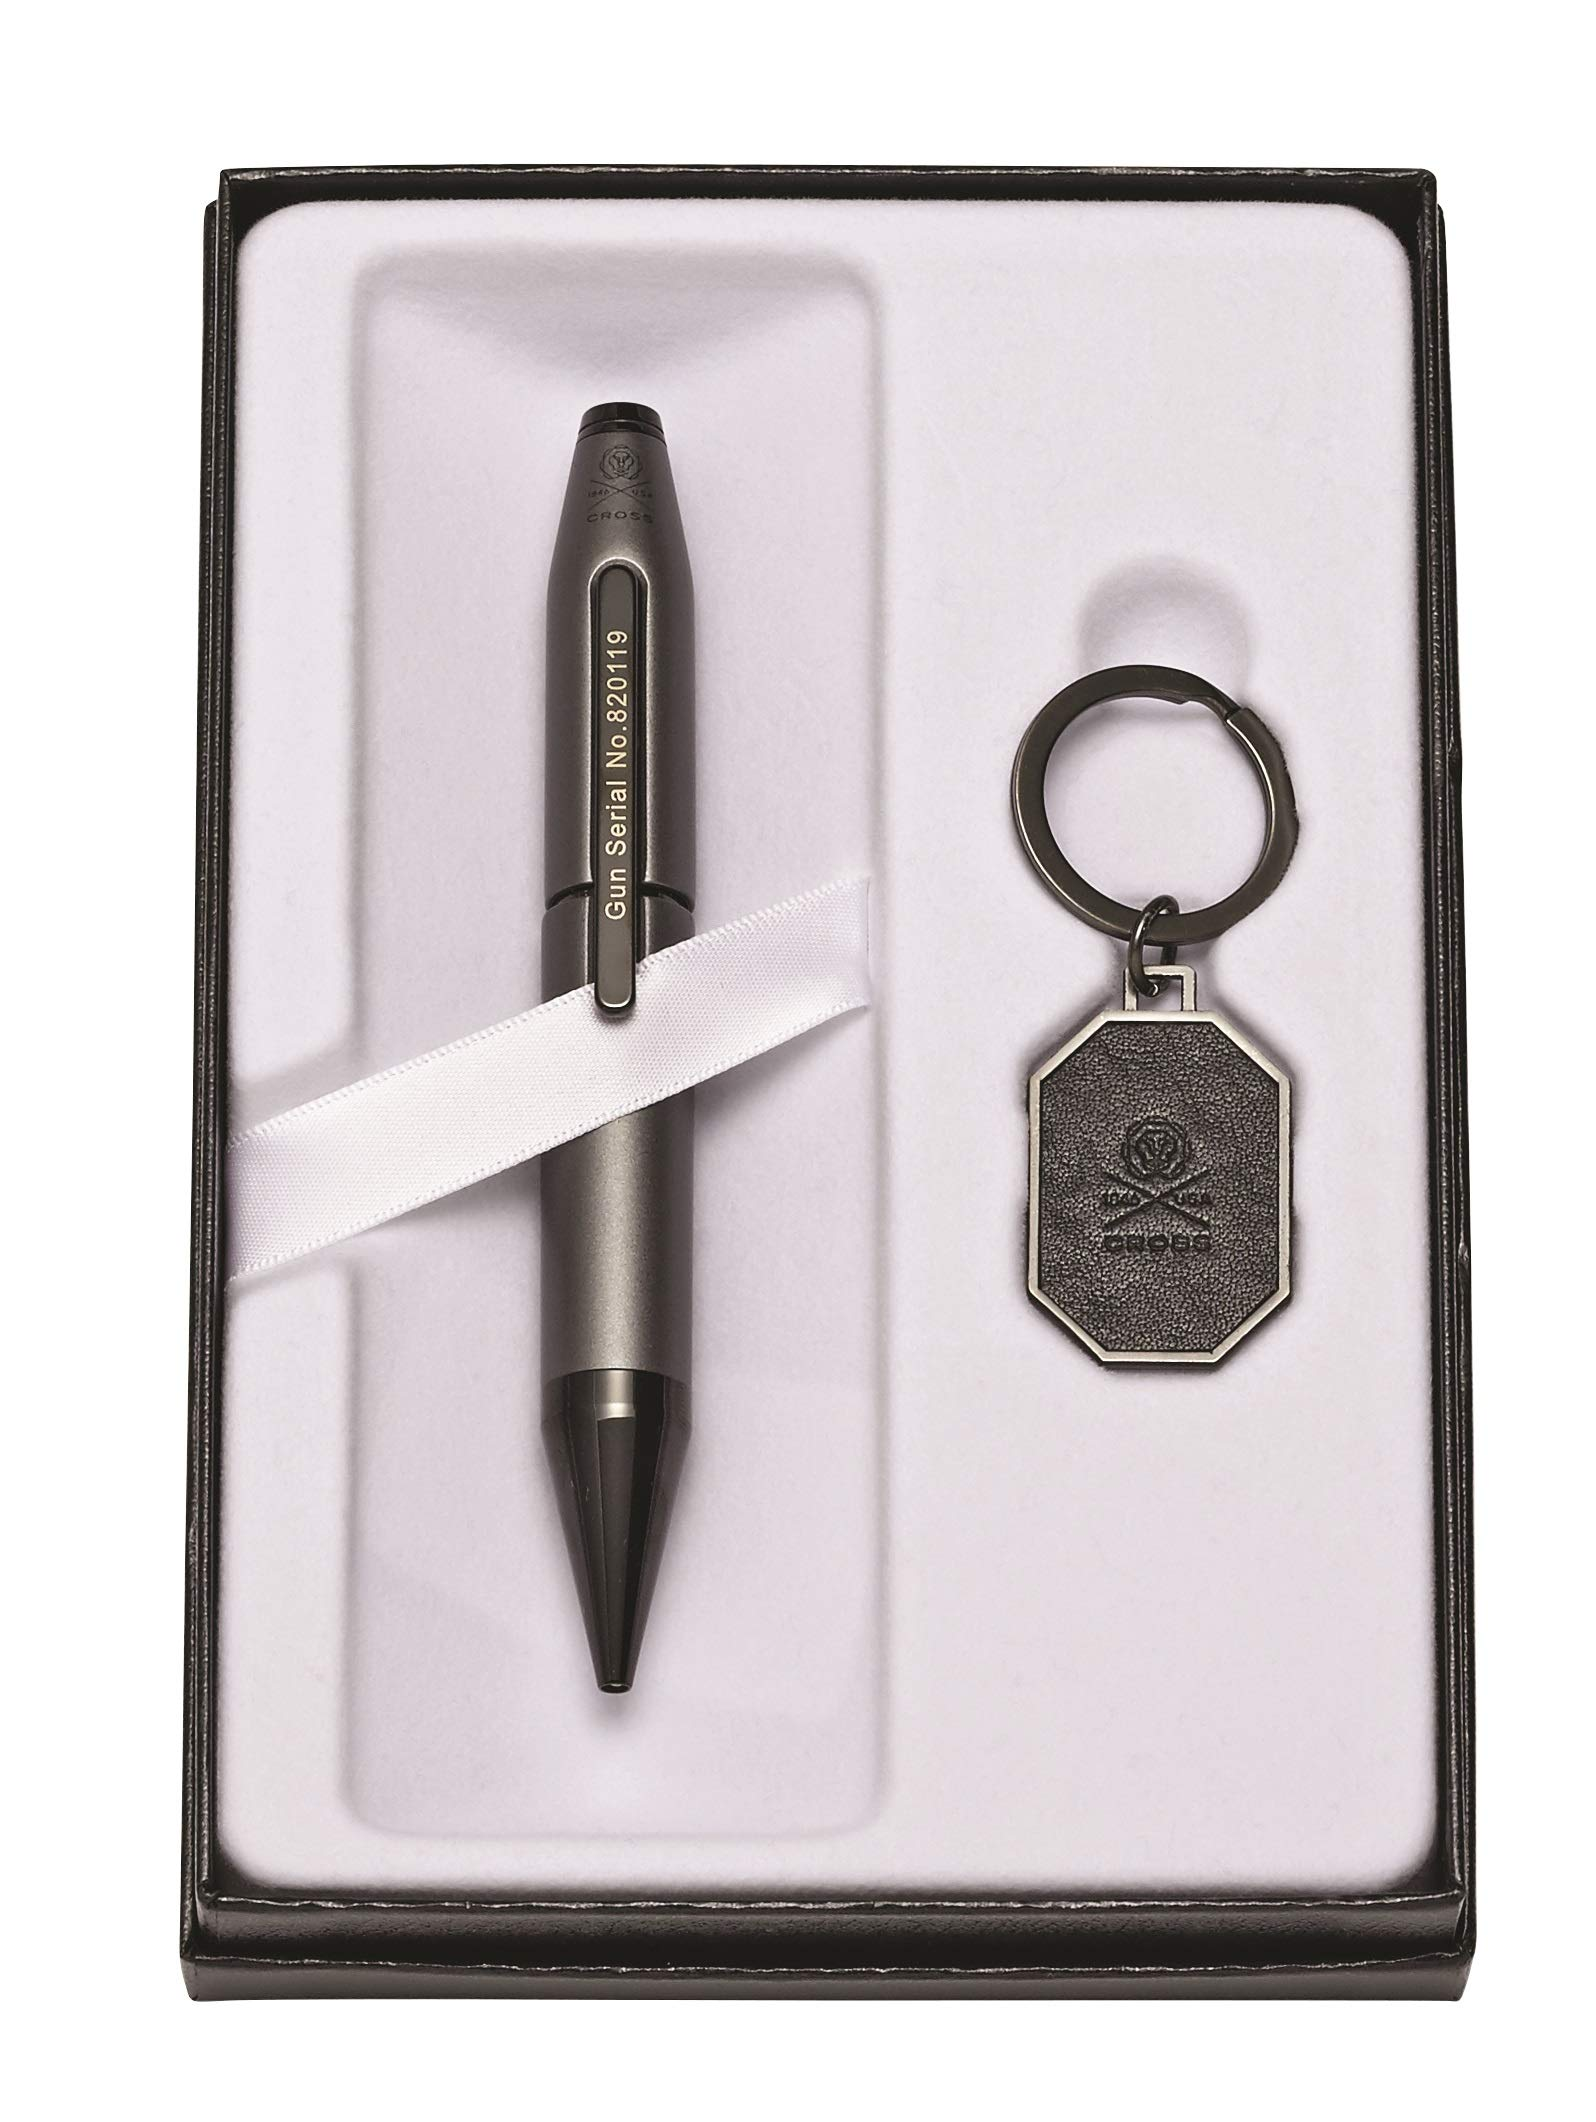 Cross Cross X Gunmetal Gray Liberty United Rollerball Pen & Liberty United Key Ring by Cross (Image #1)